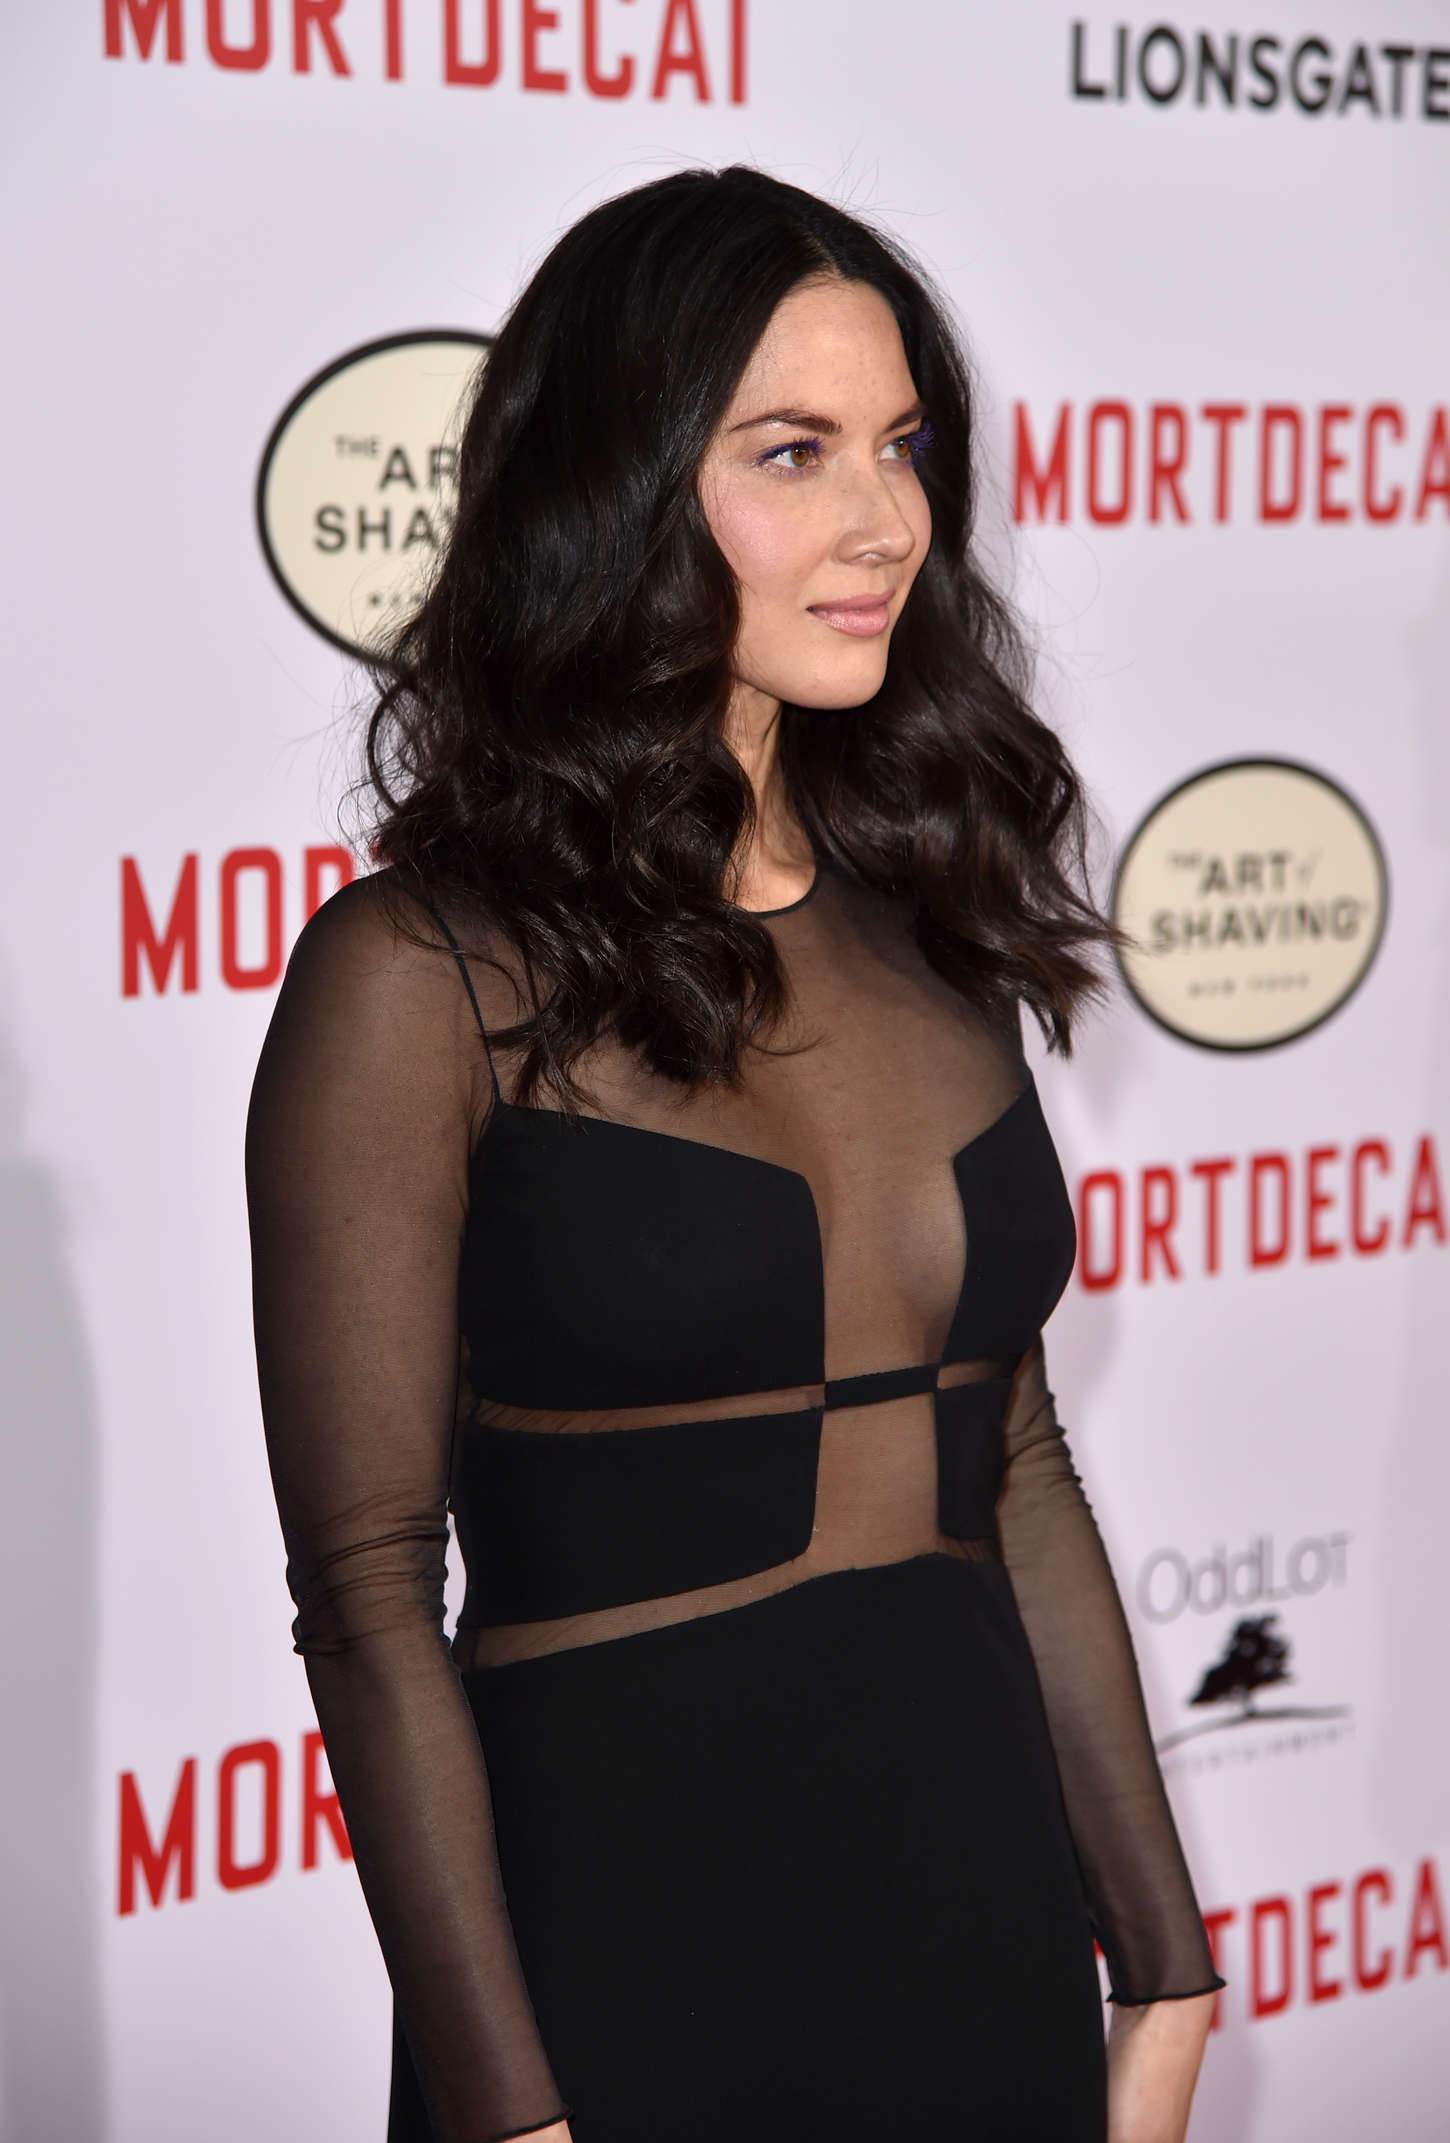 Olivia Munn 2015 : Olivia Munn: Mortdecai LA Premiere -13